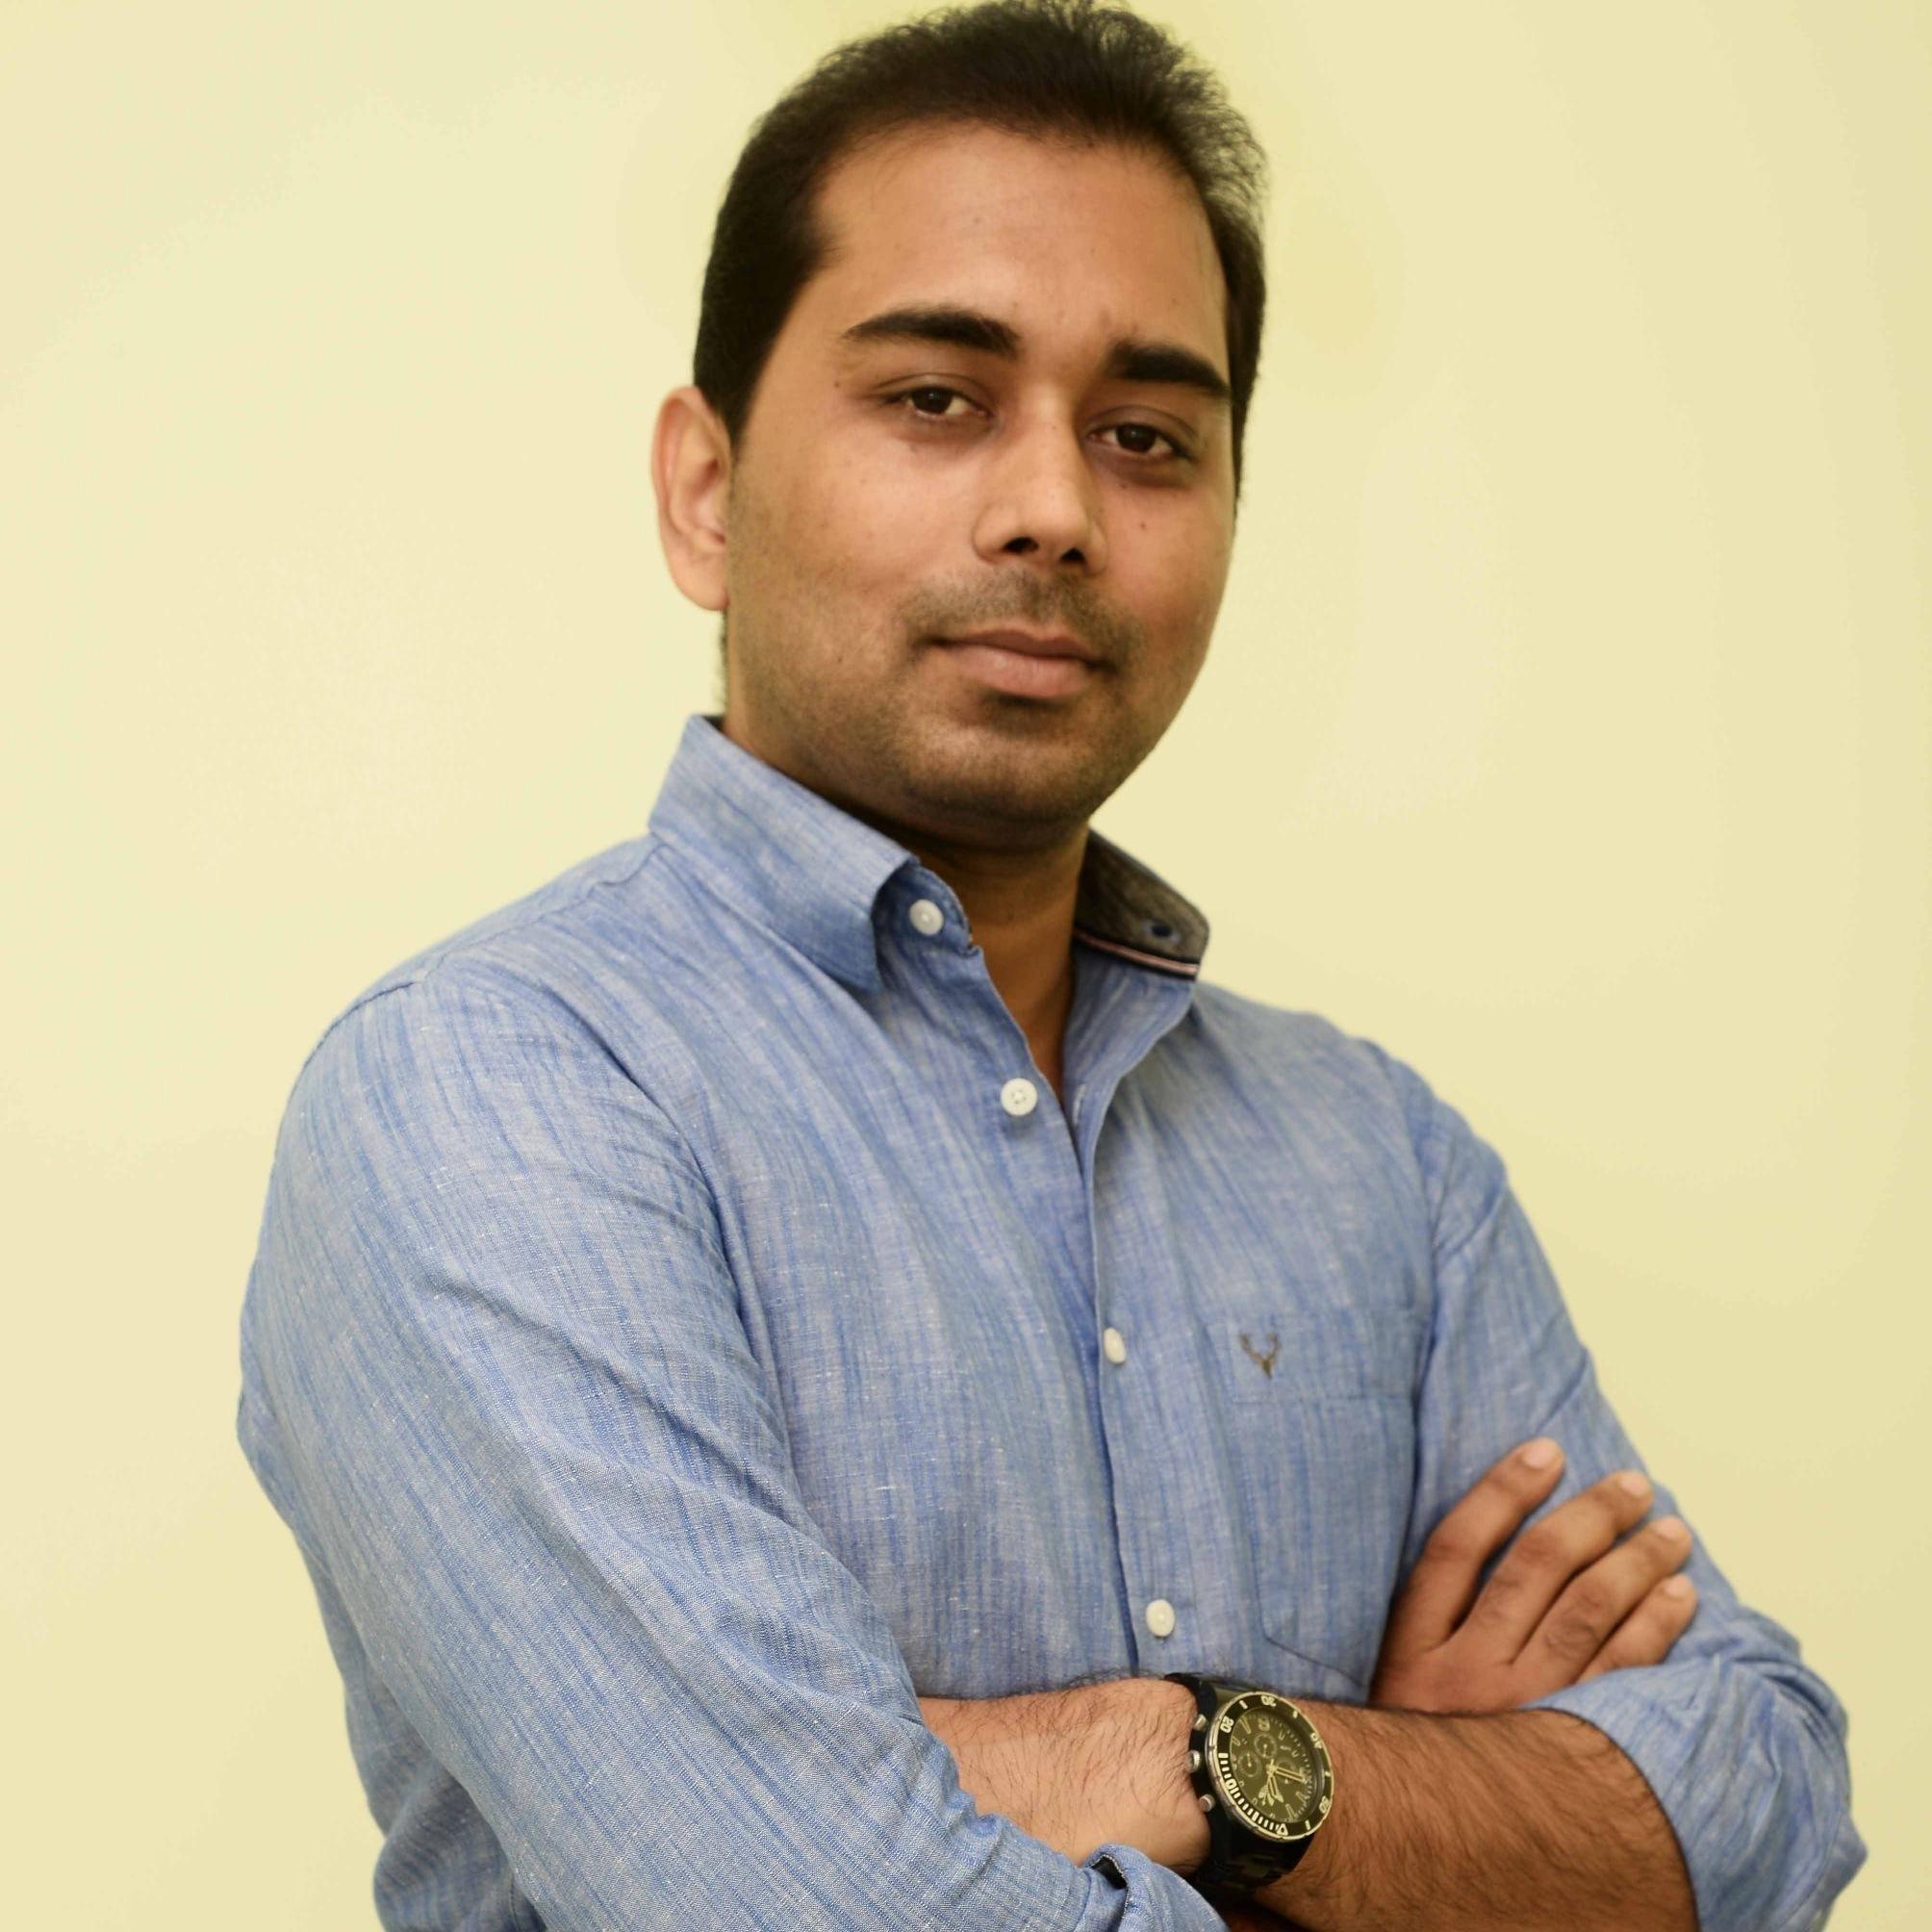 Vishnu Vankayala